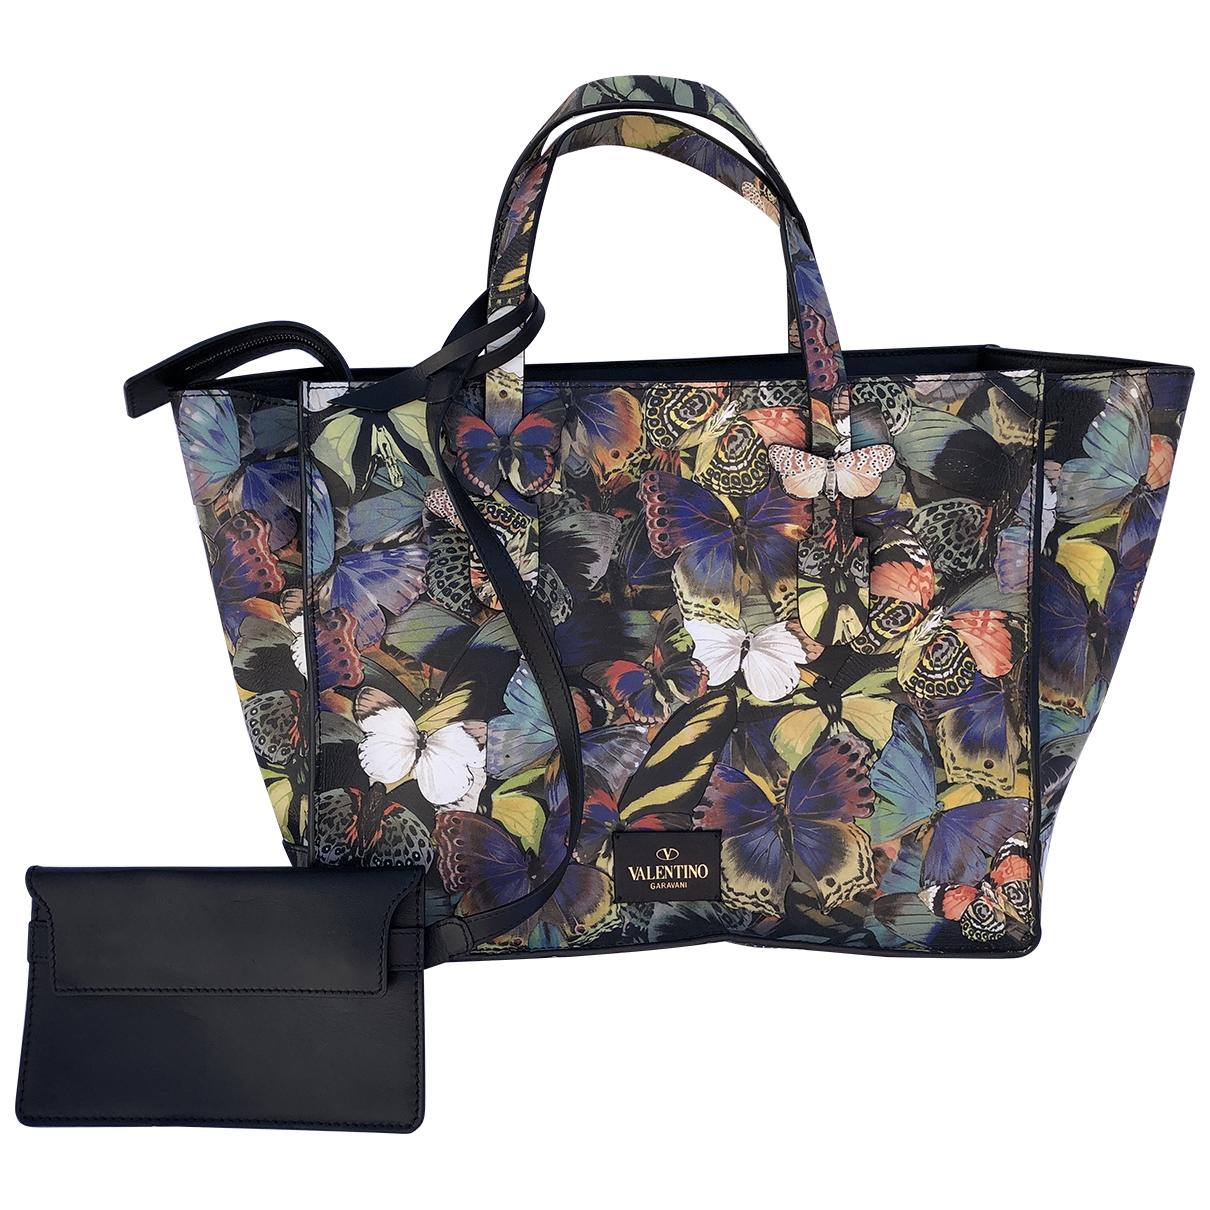 Valentino Garavani \N Multicolour Leather handbag for Women \N